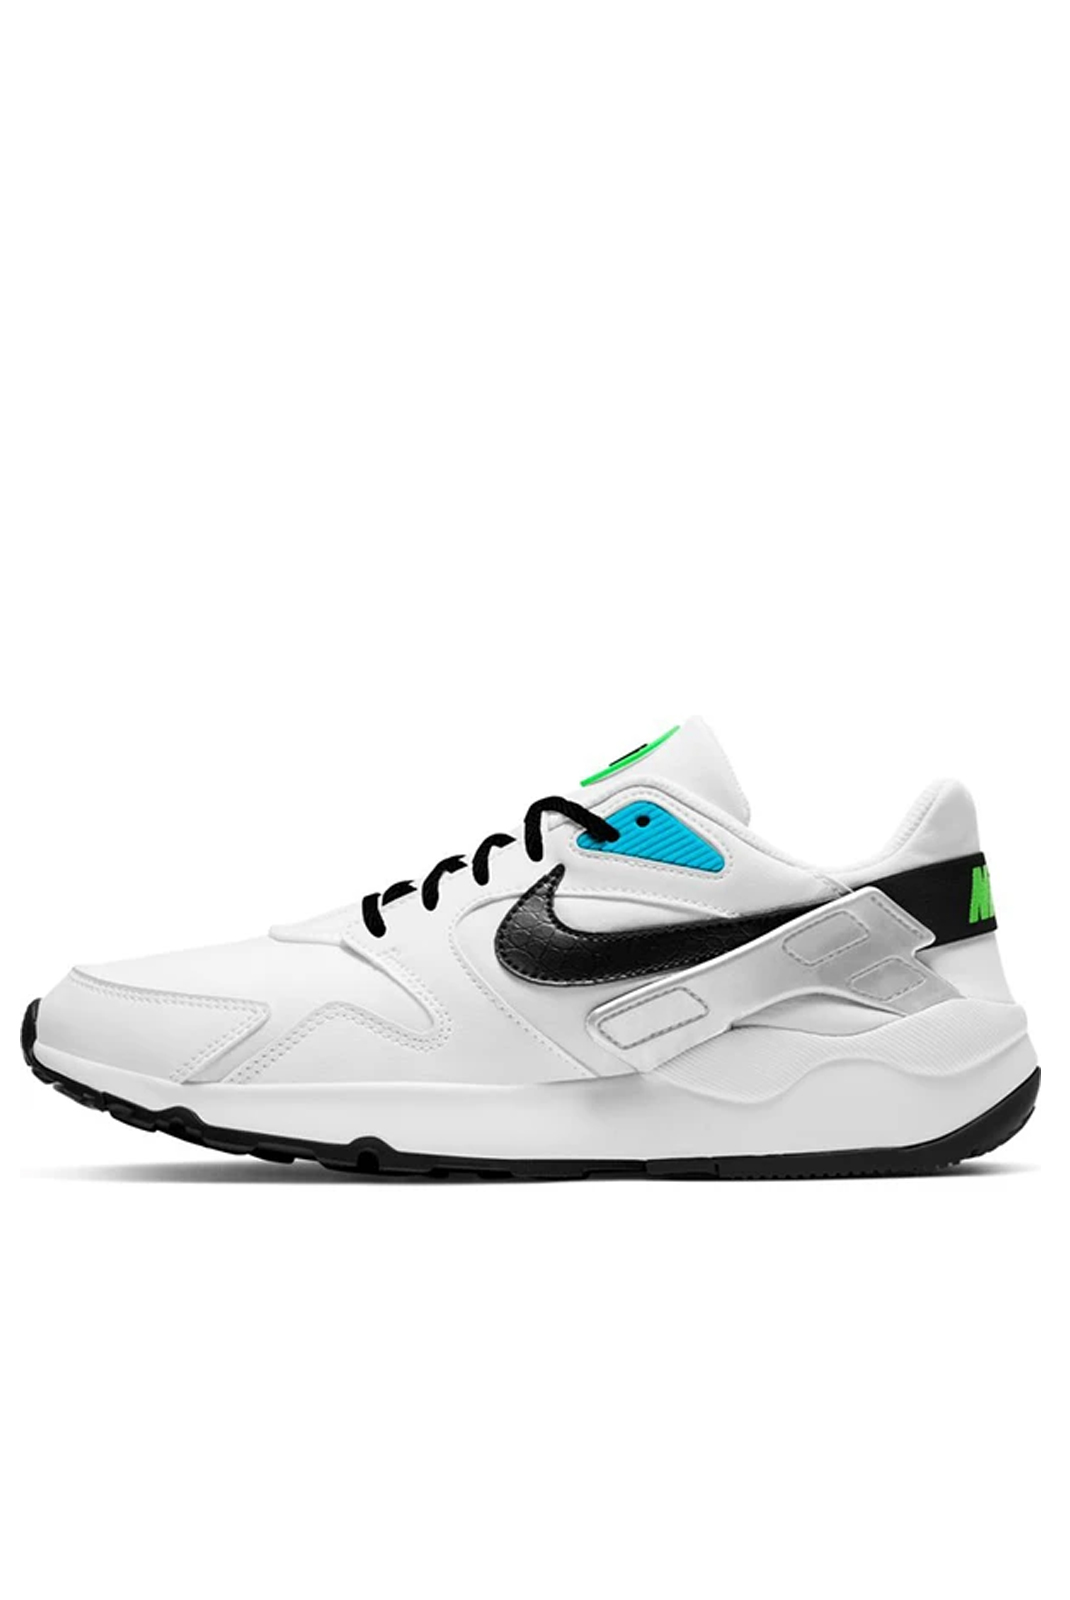 Baskets / Sport  Nike AT4249 105 LD VICTORY blanc